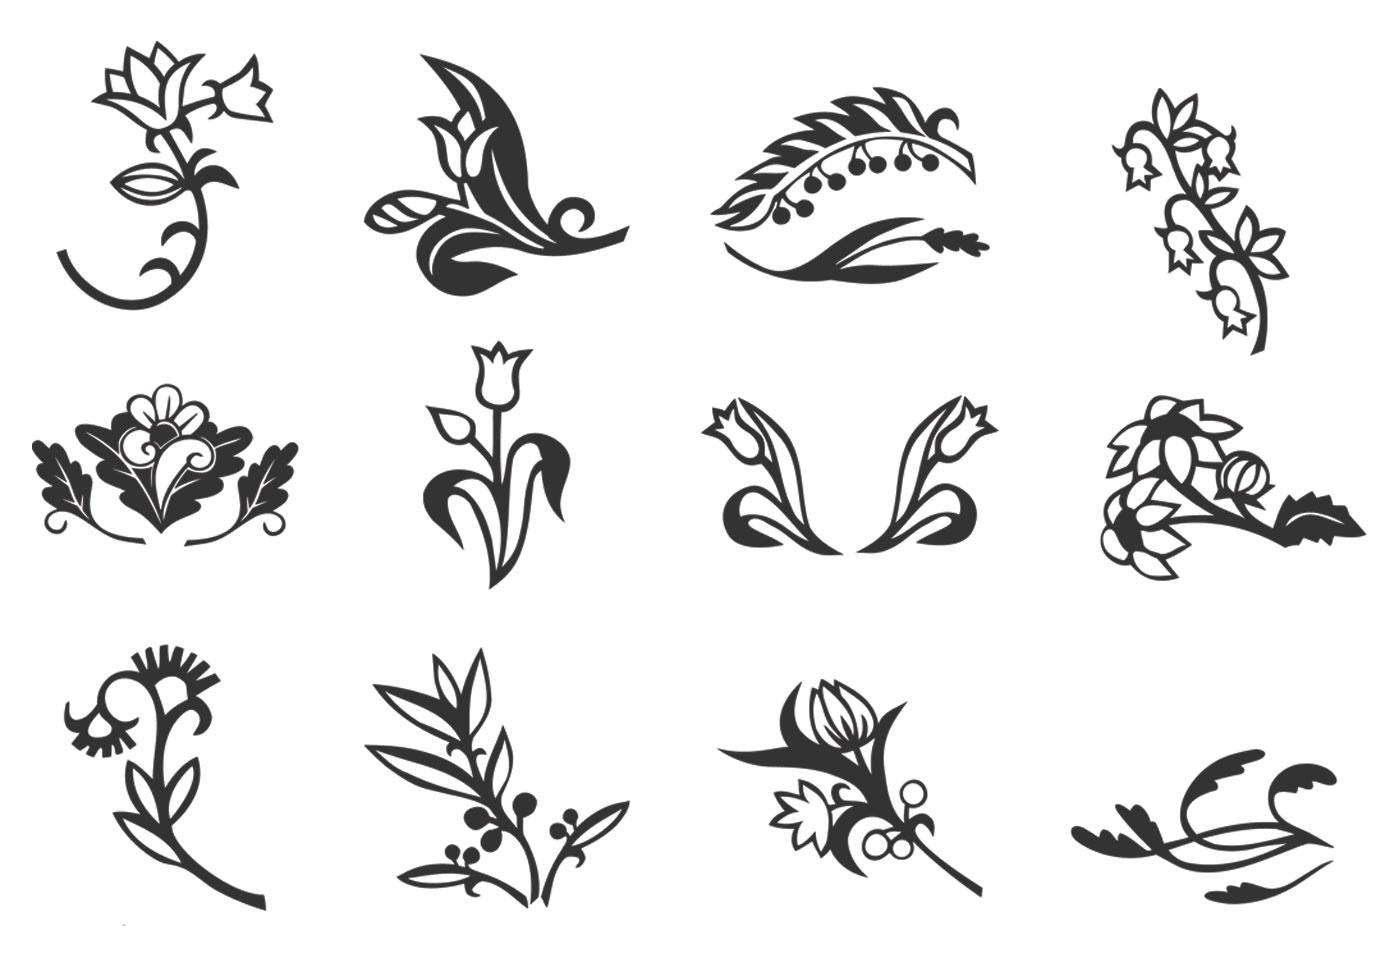 13 Floral Vector Ornament Set Images